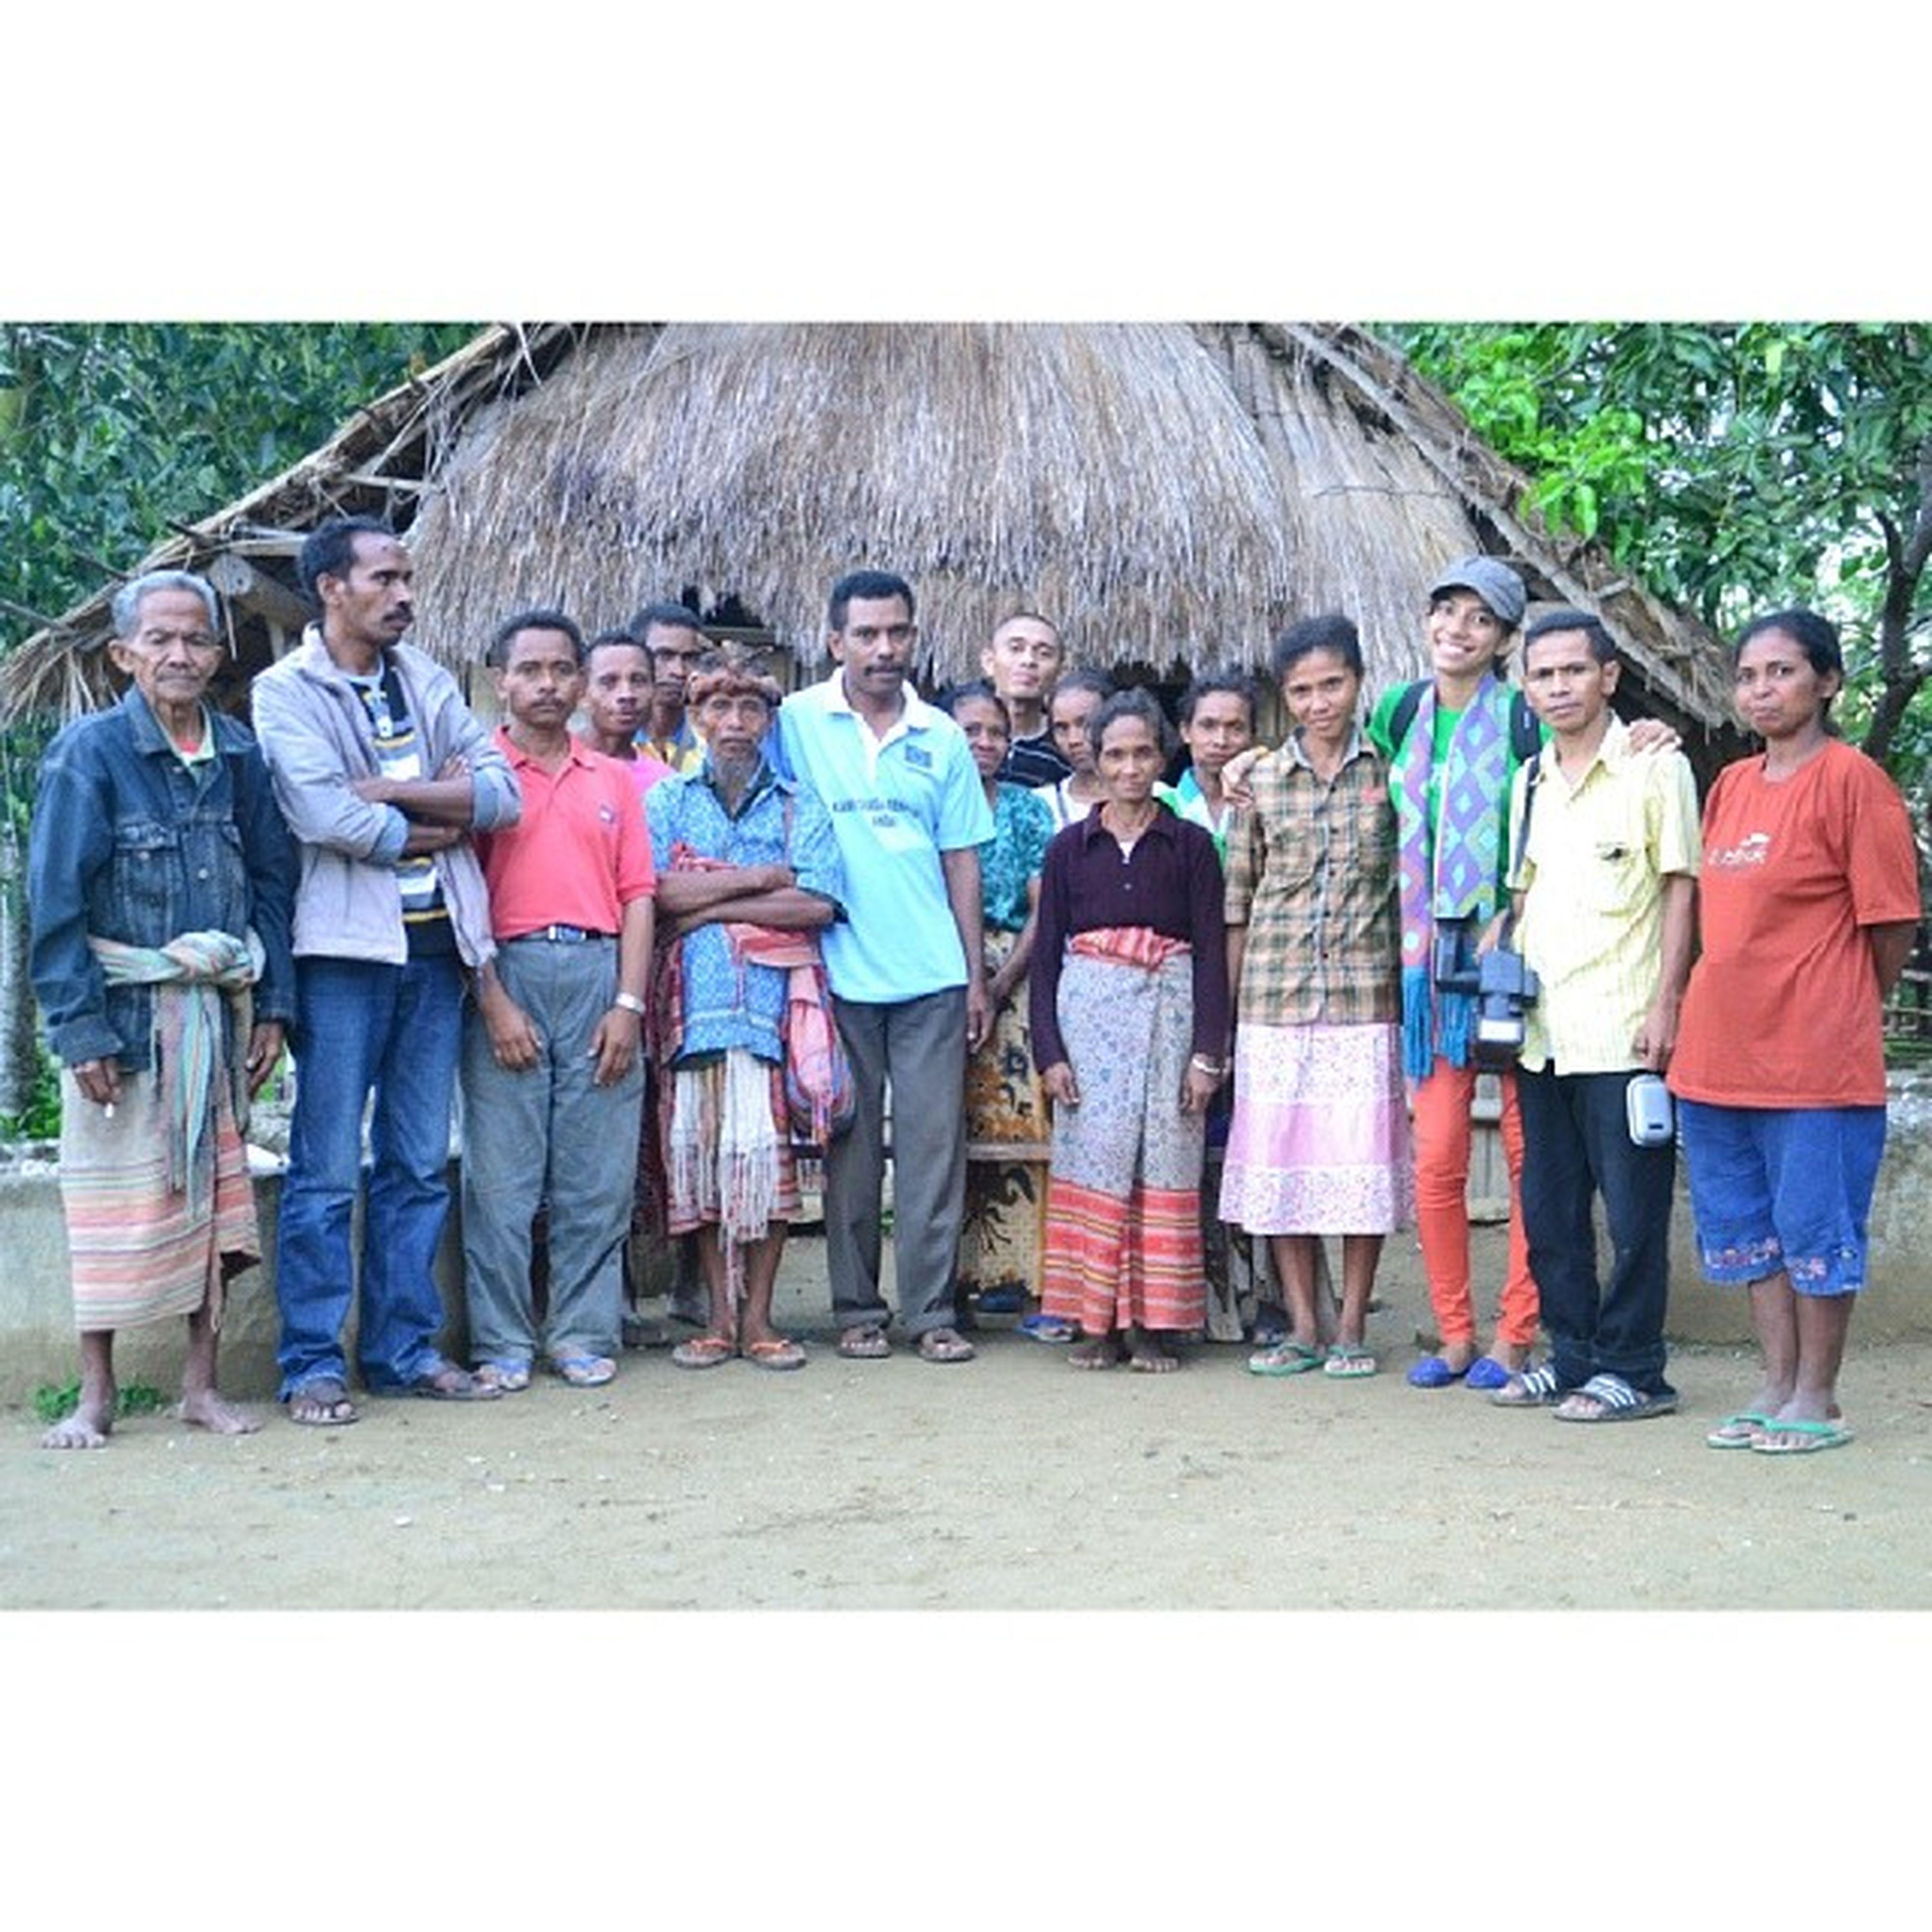 Desa Enoneontes, Kab. TTS Lopo Etnik Lumbung Animasi sdm